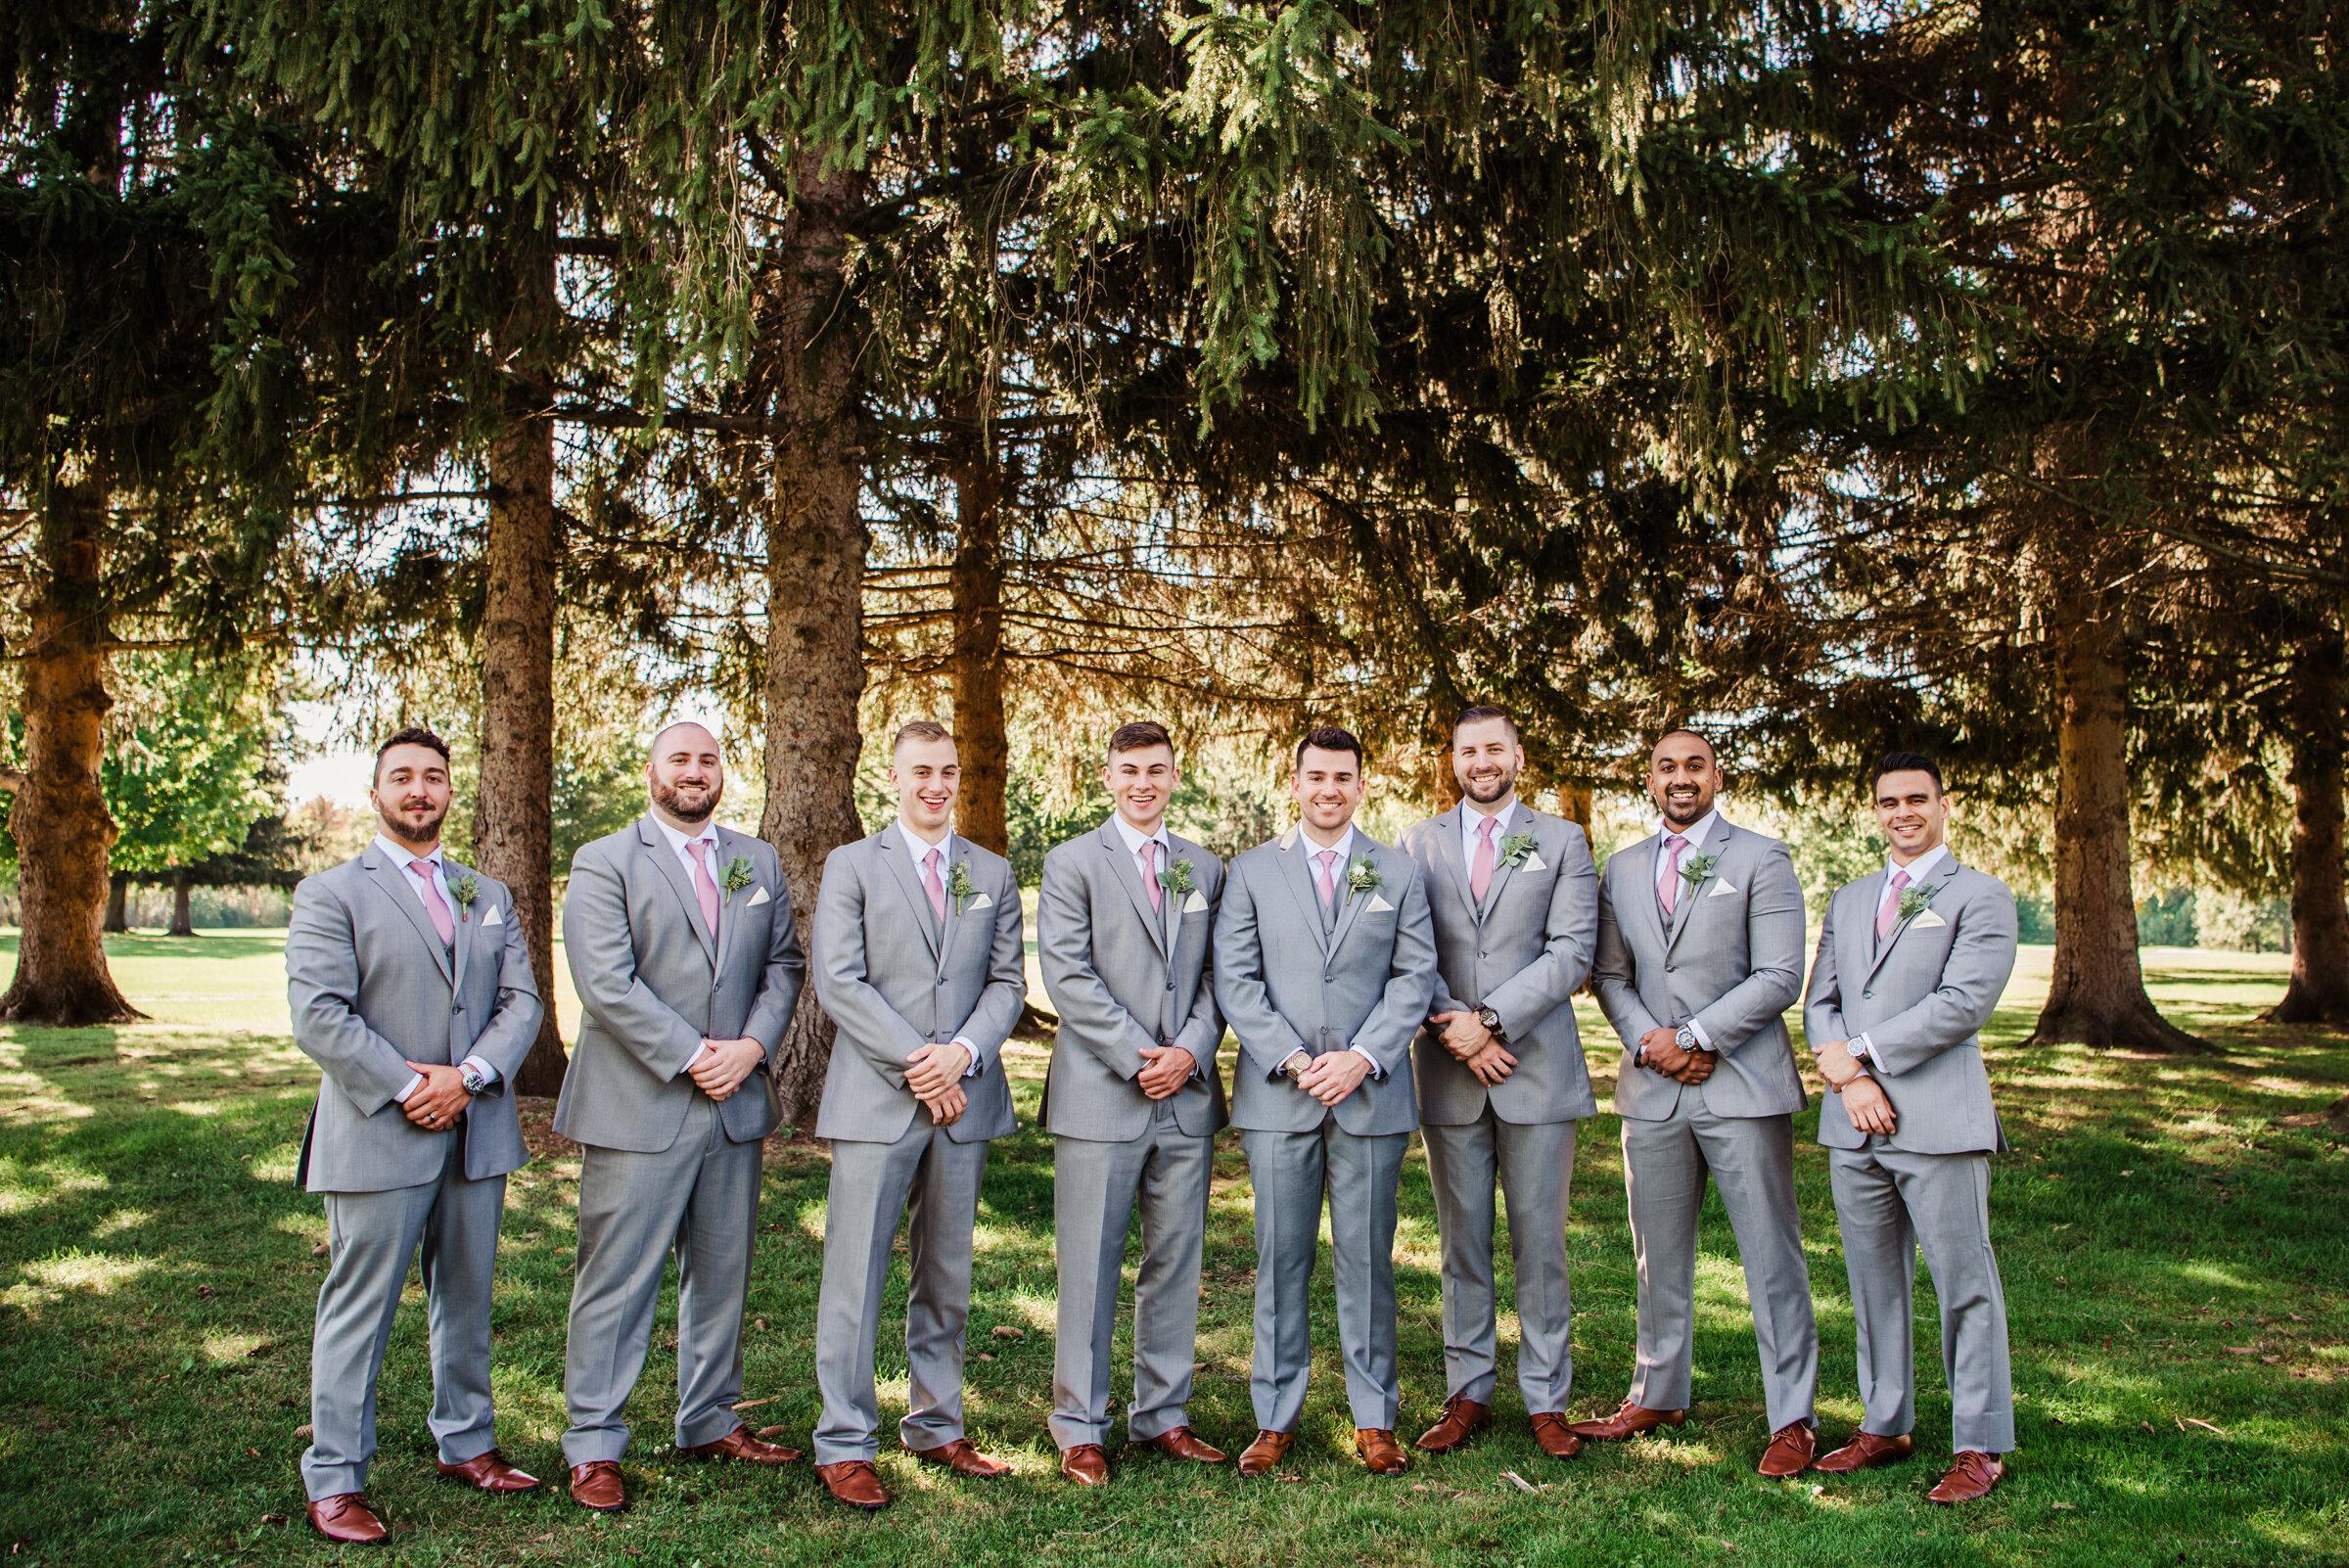 Deerfield_Country_Club_Rochester_Wedding_JILL_STUDIO_Rochester_NY_Photographer_DSC_6159.jpg